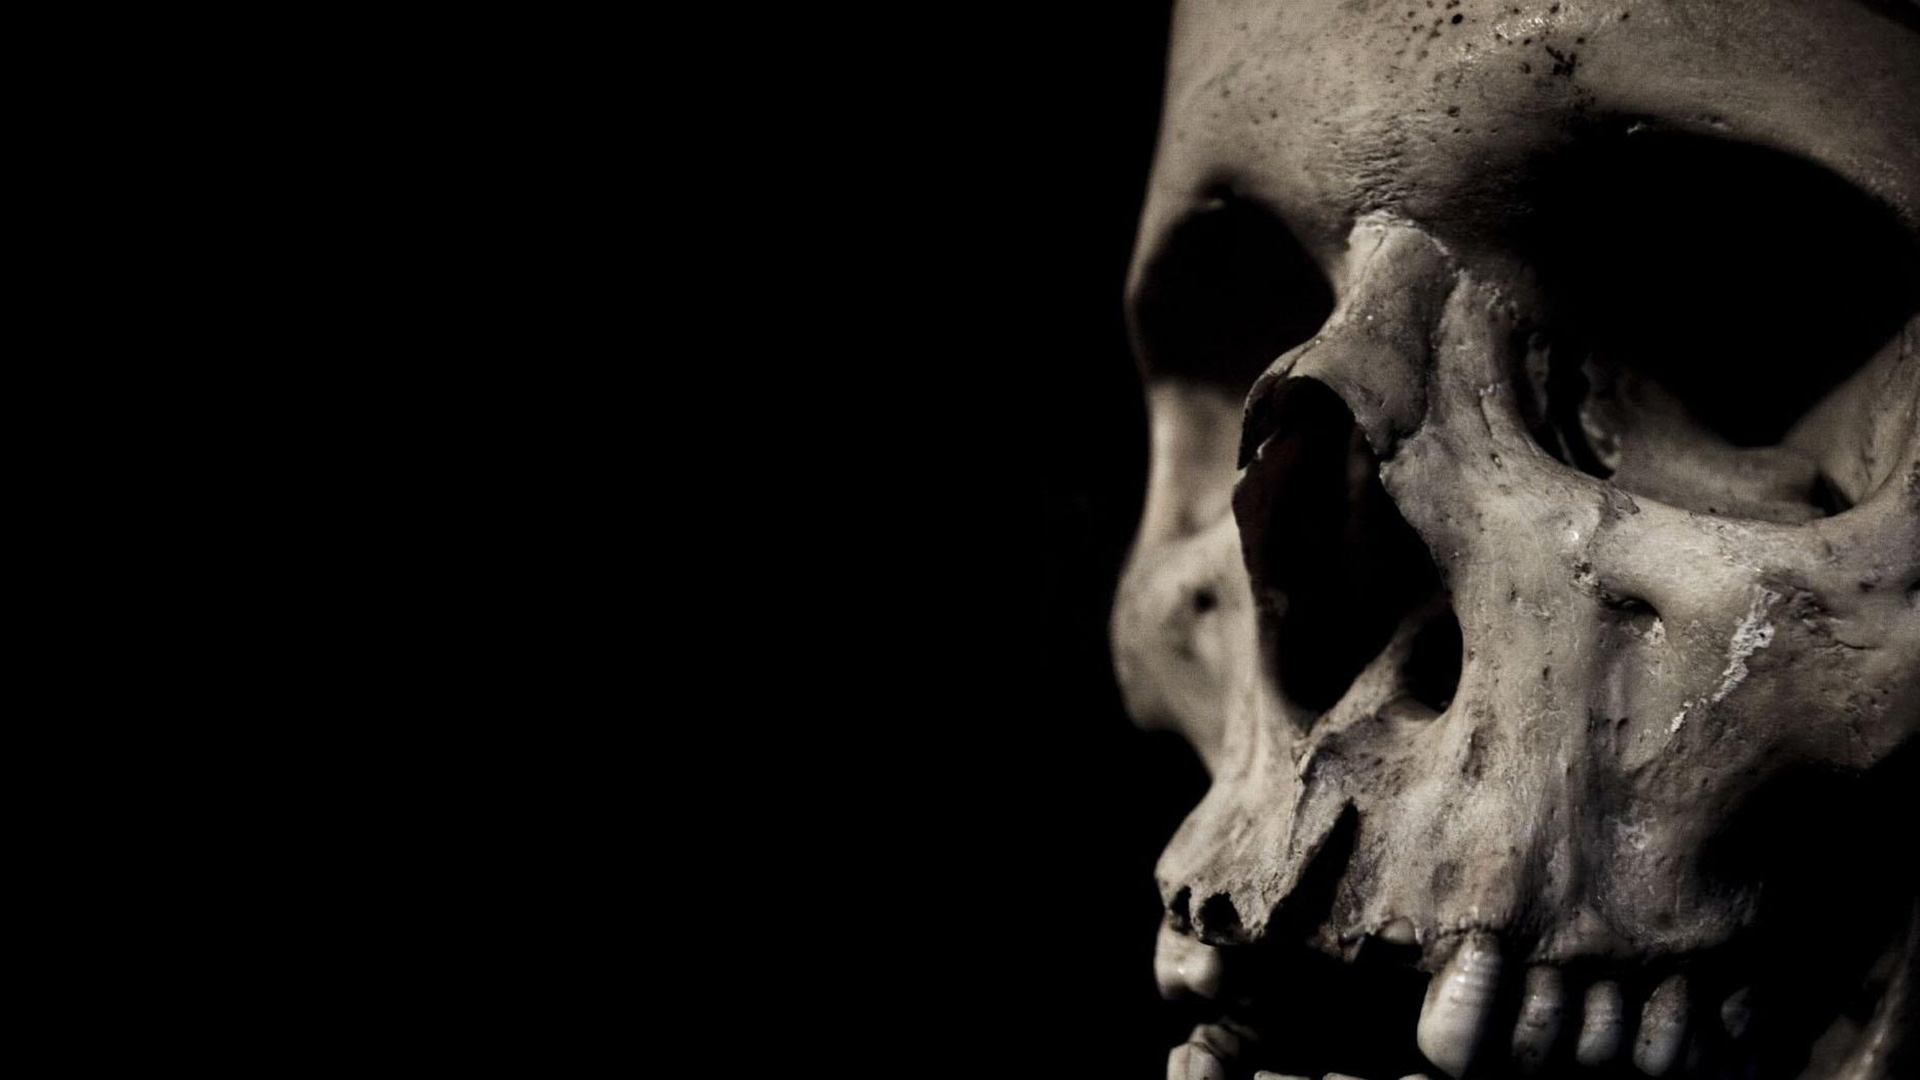 Skull Full HD Wallpaper And Background Image